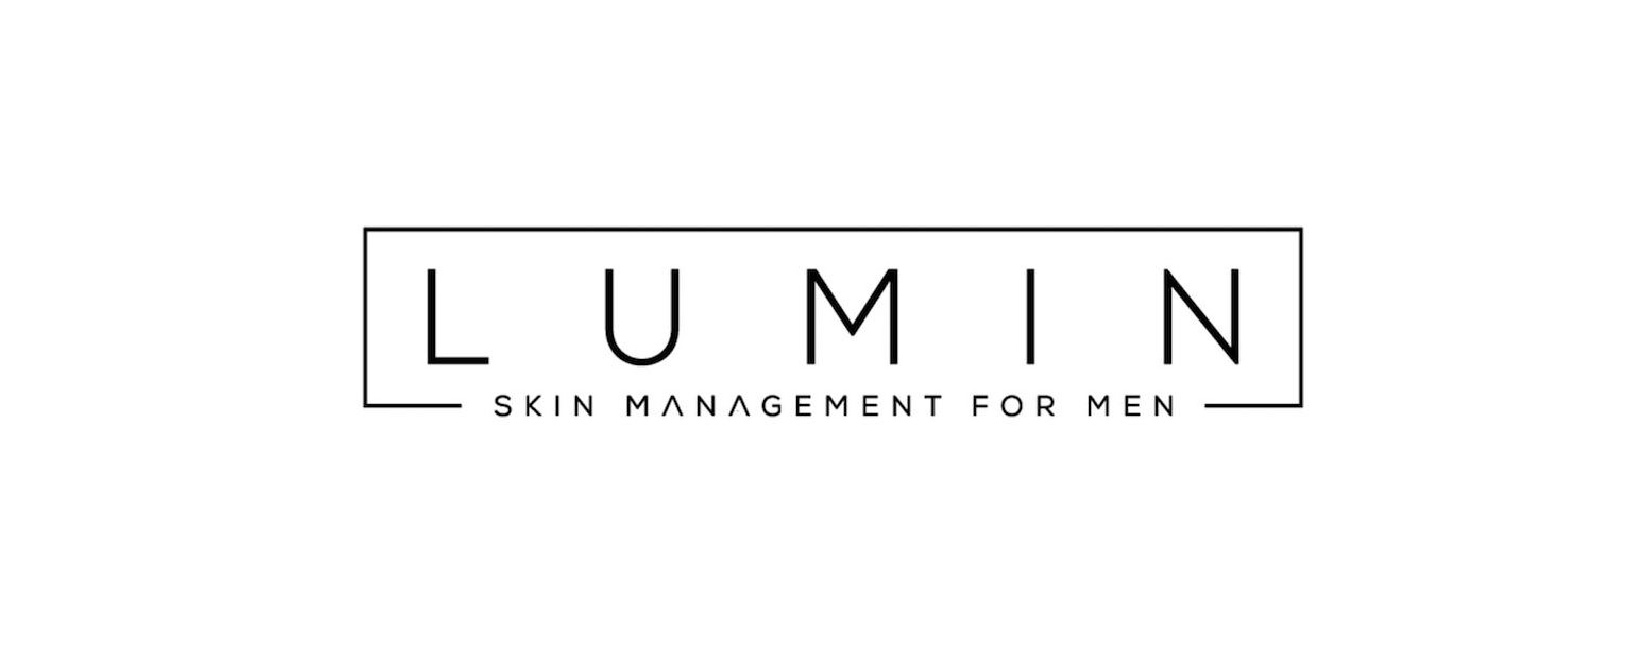 The Best Skincare for Men – Lumin Review